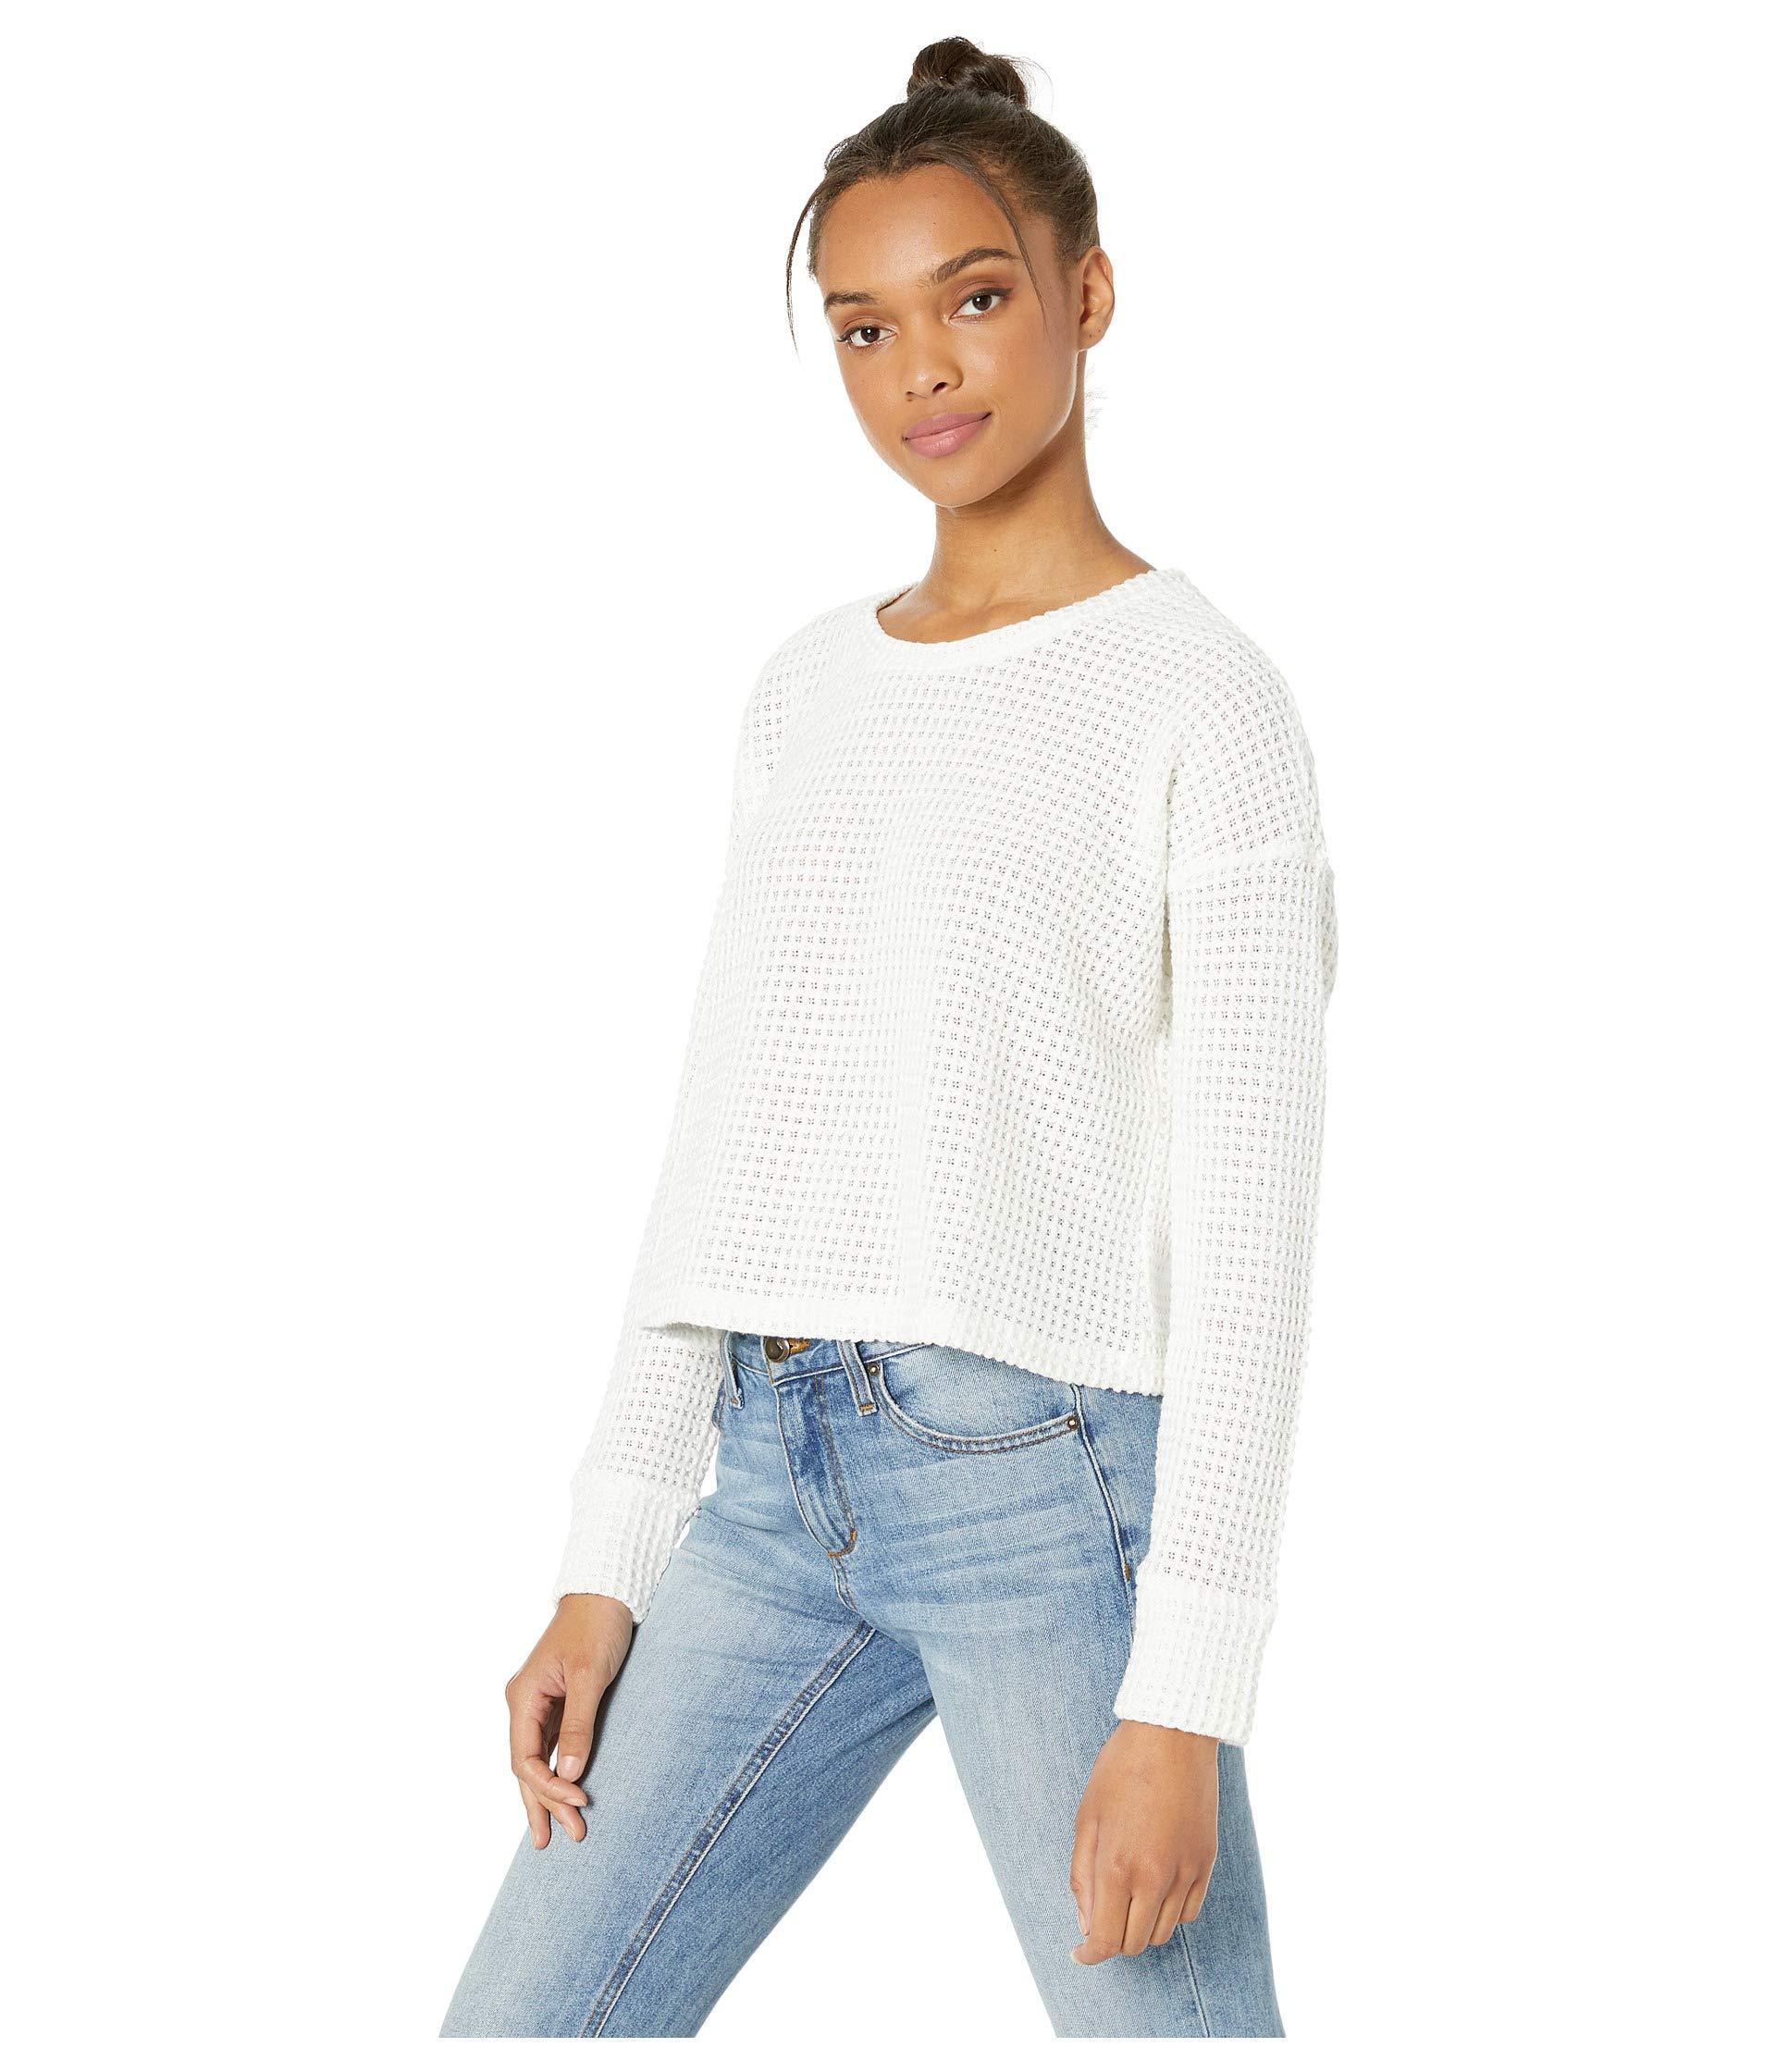 Cashmere Crop Splendid Women's Sweater B knwXNOPZ80